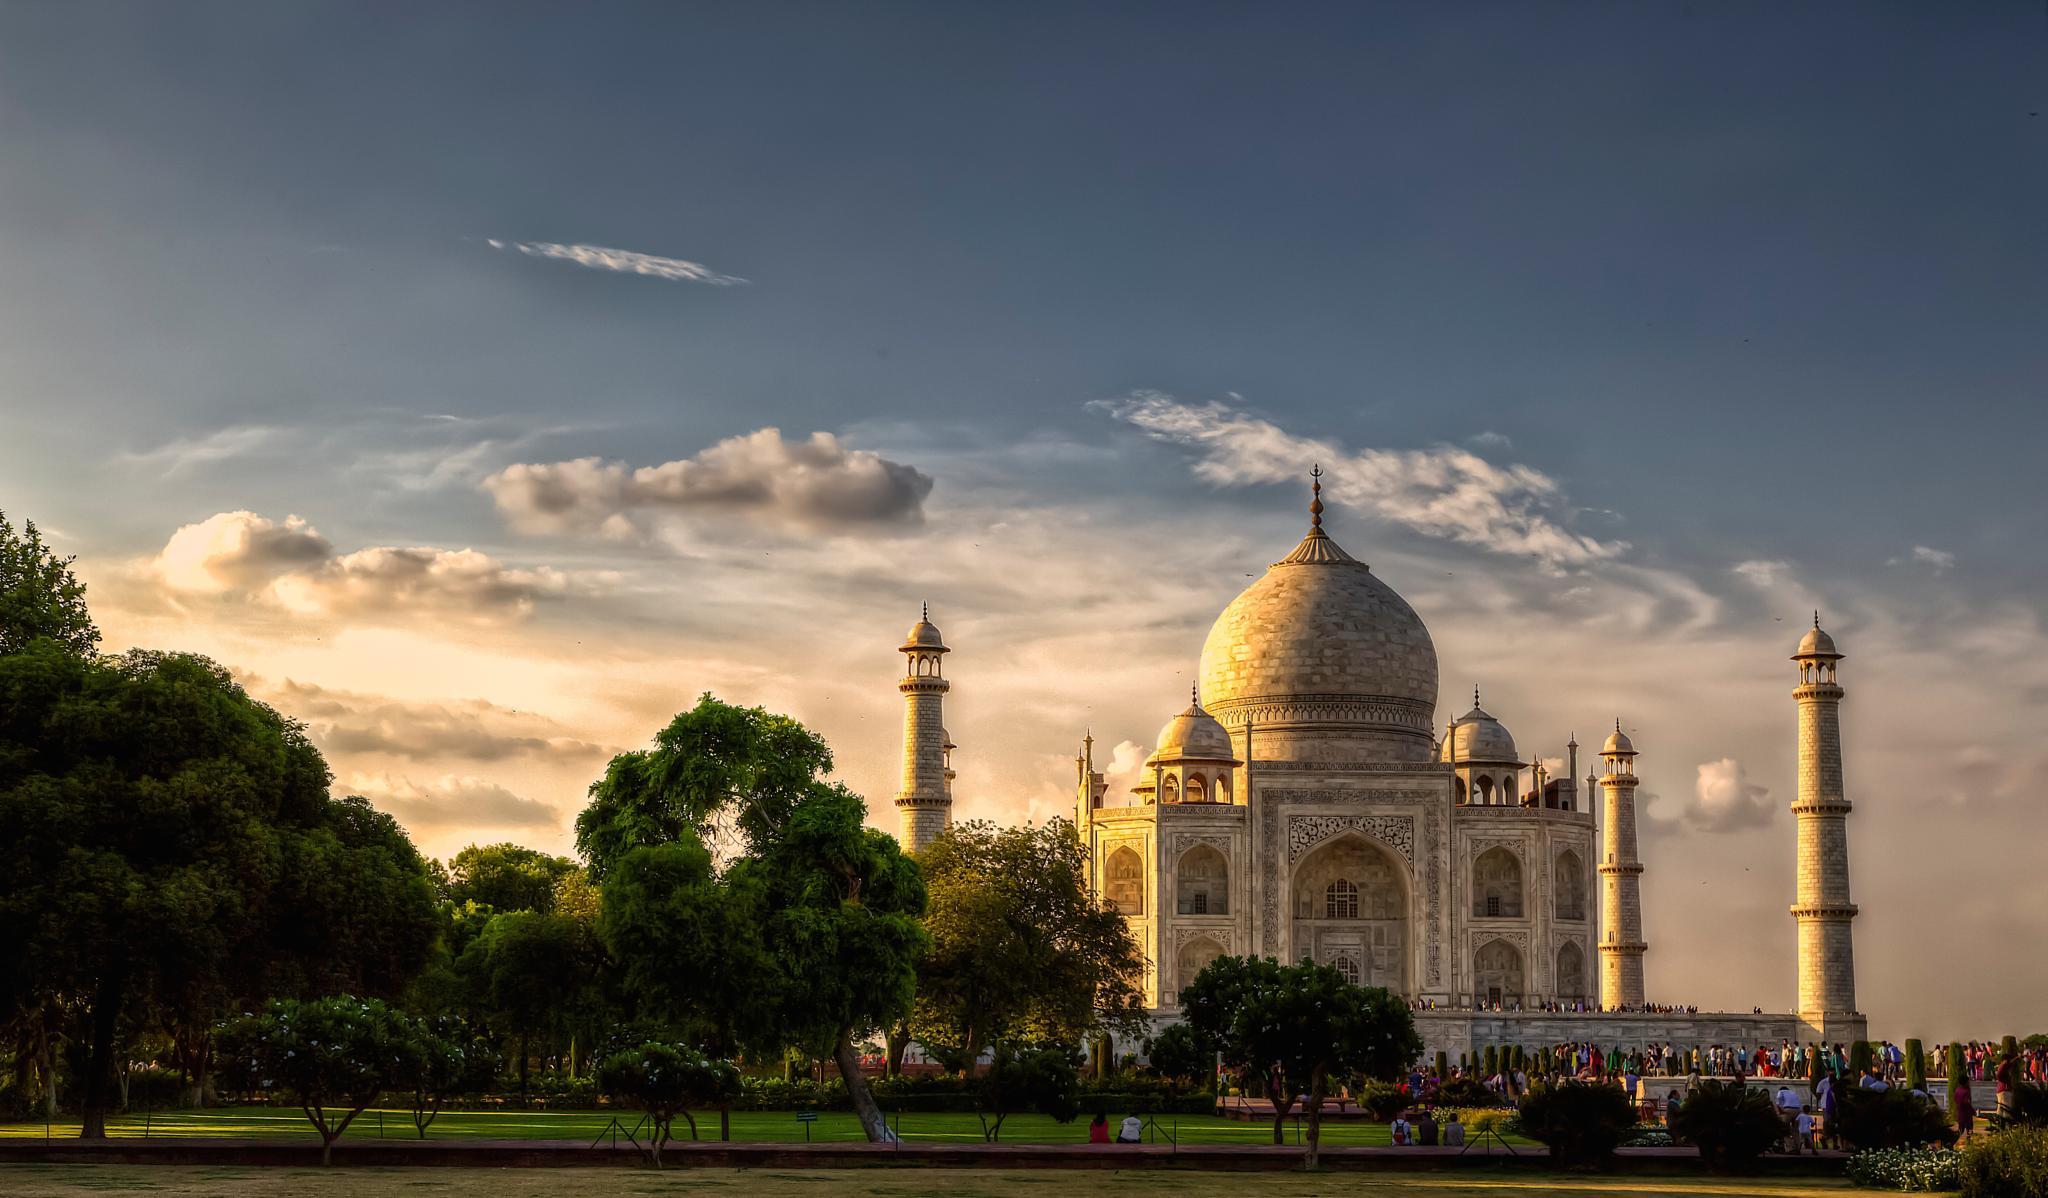 Inde Taj Mahal by Sylvain LANDRY